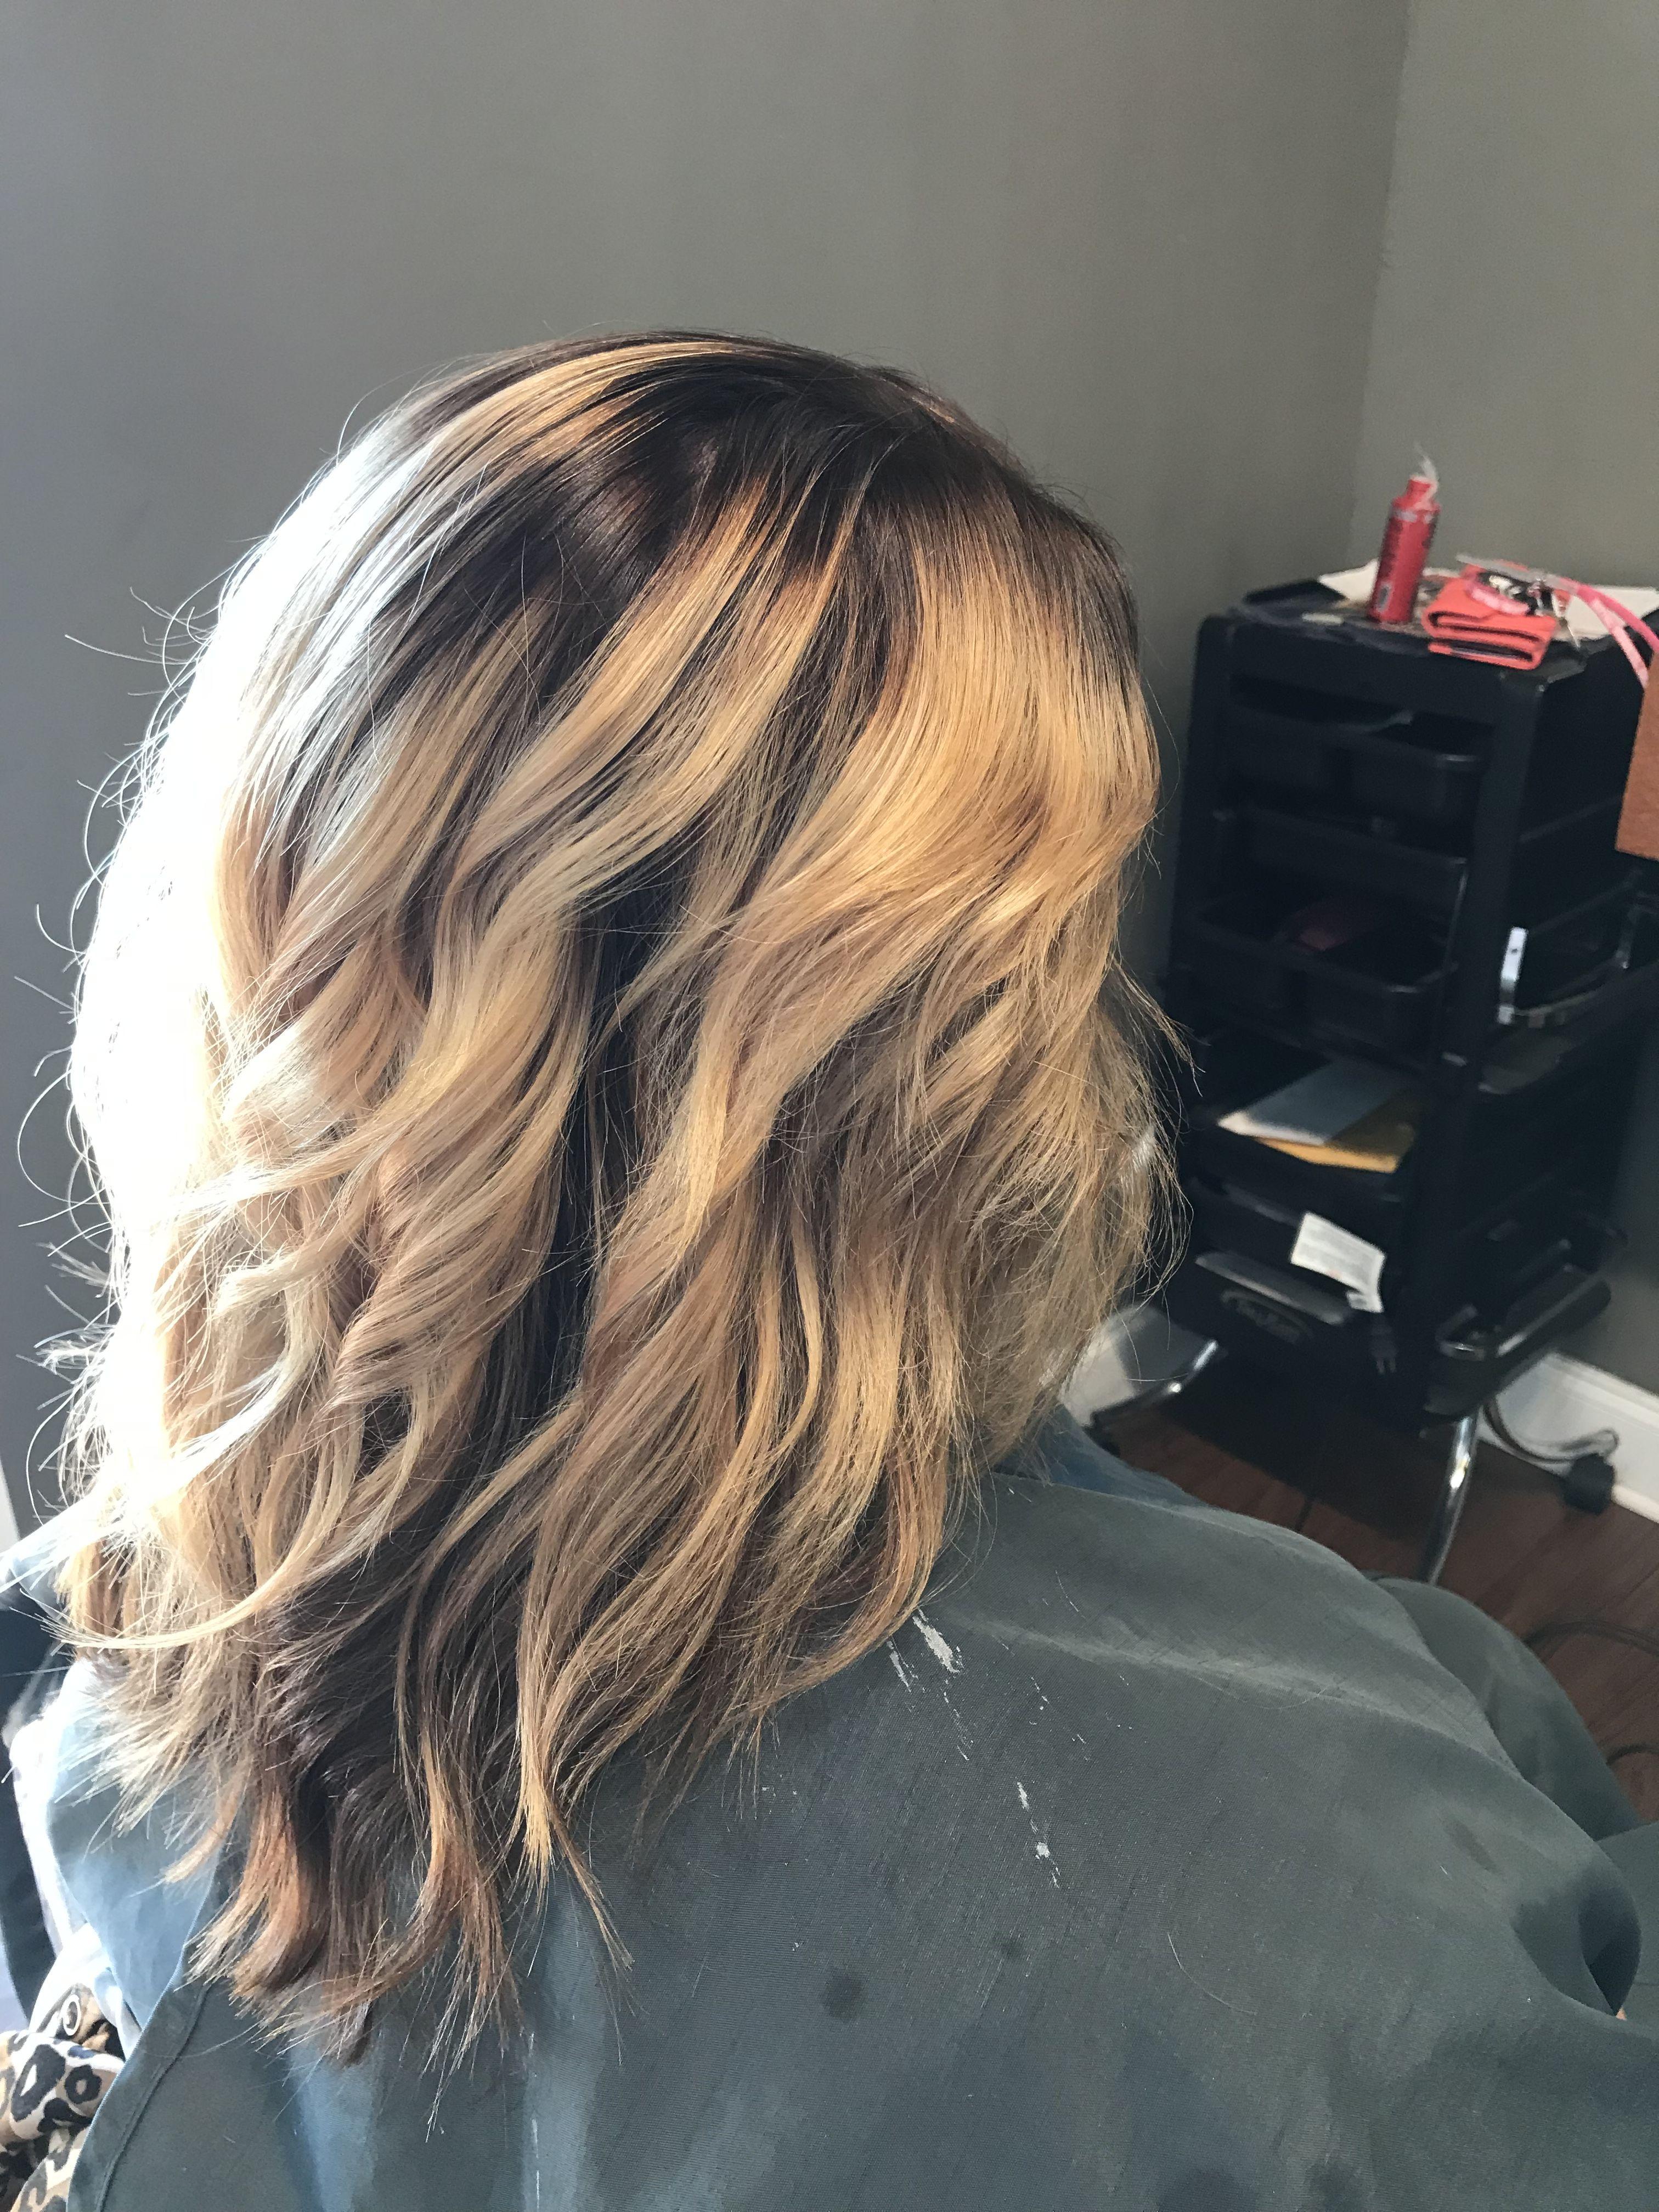 Ium so in love hair pinterest